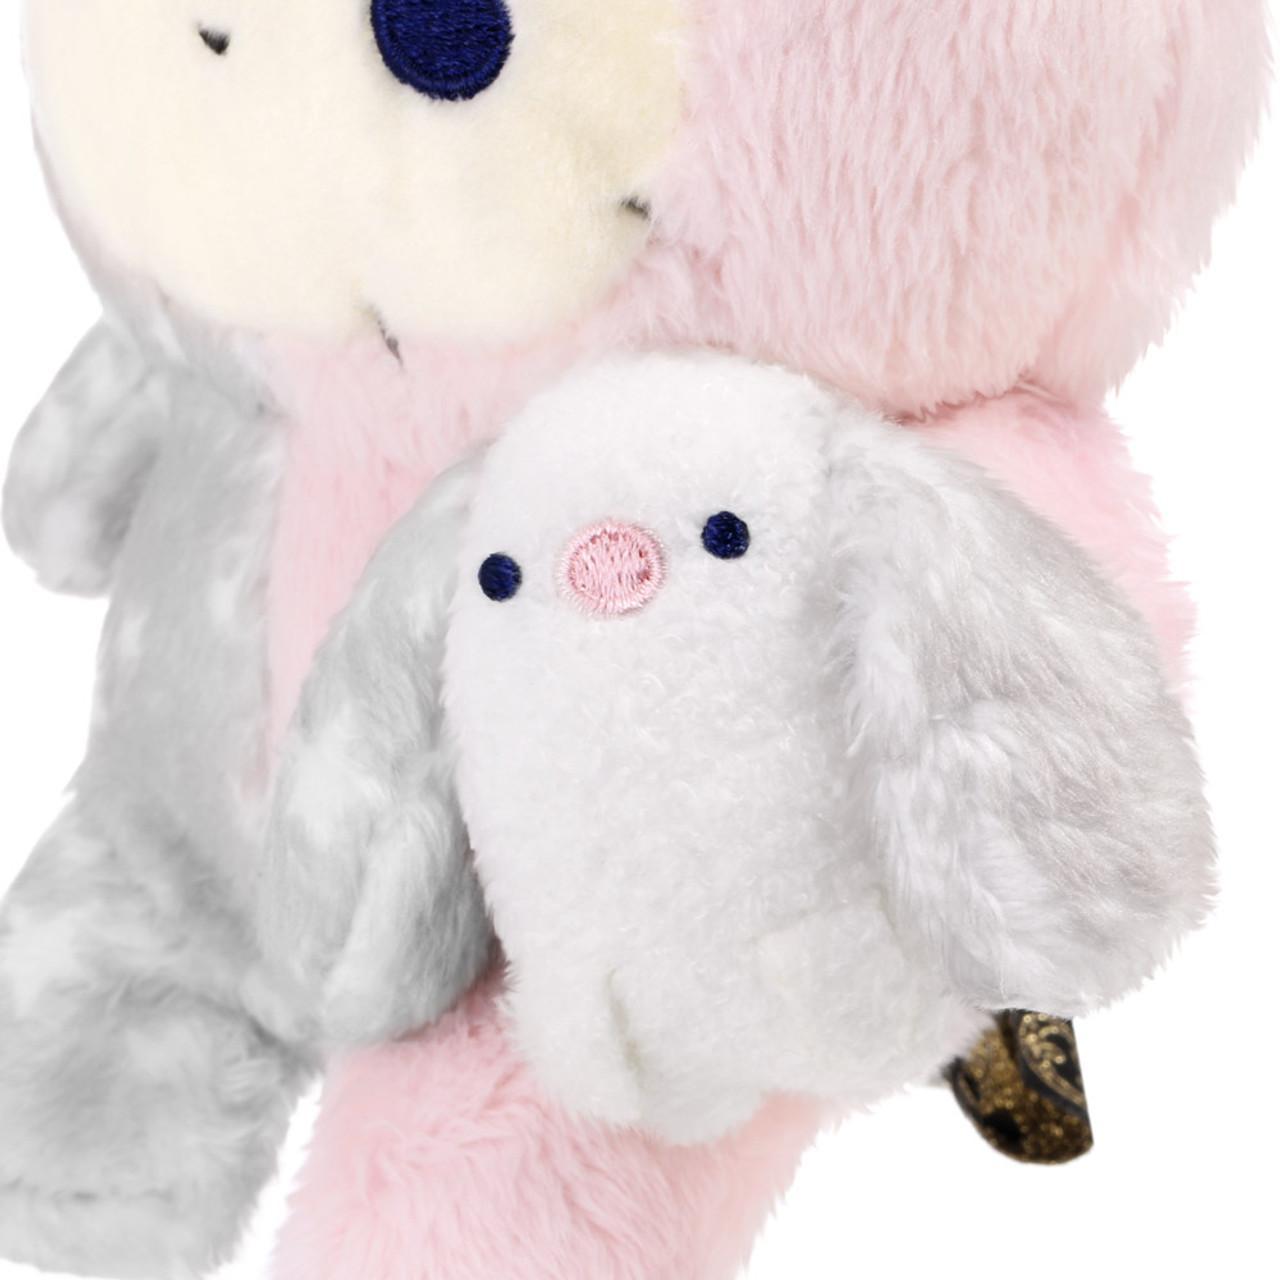 Sentimental Circus Plush Doll - Spica & PoPo ( Close-up )